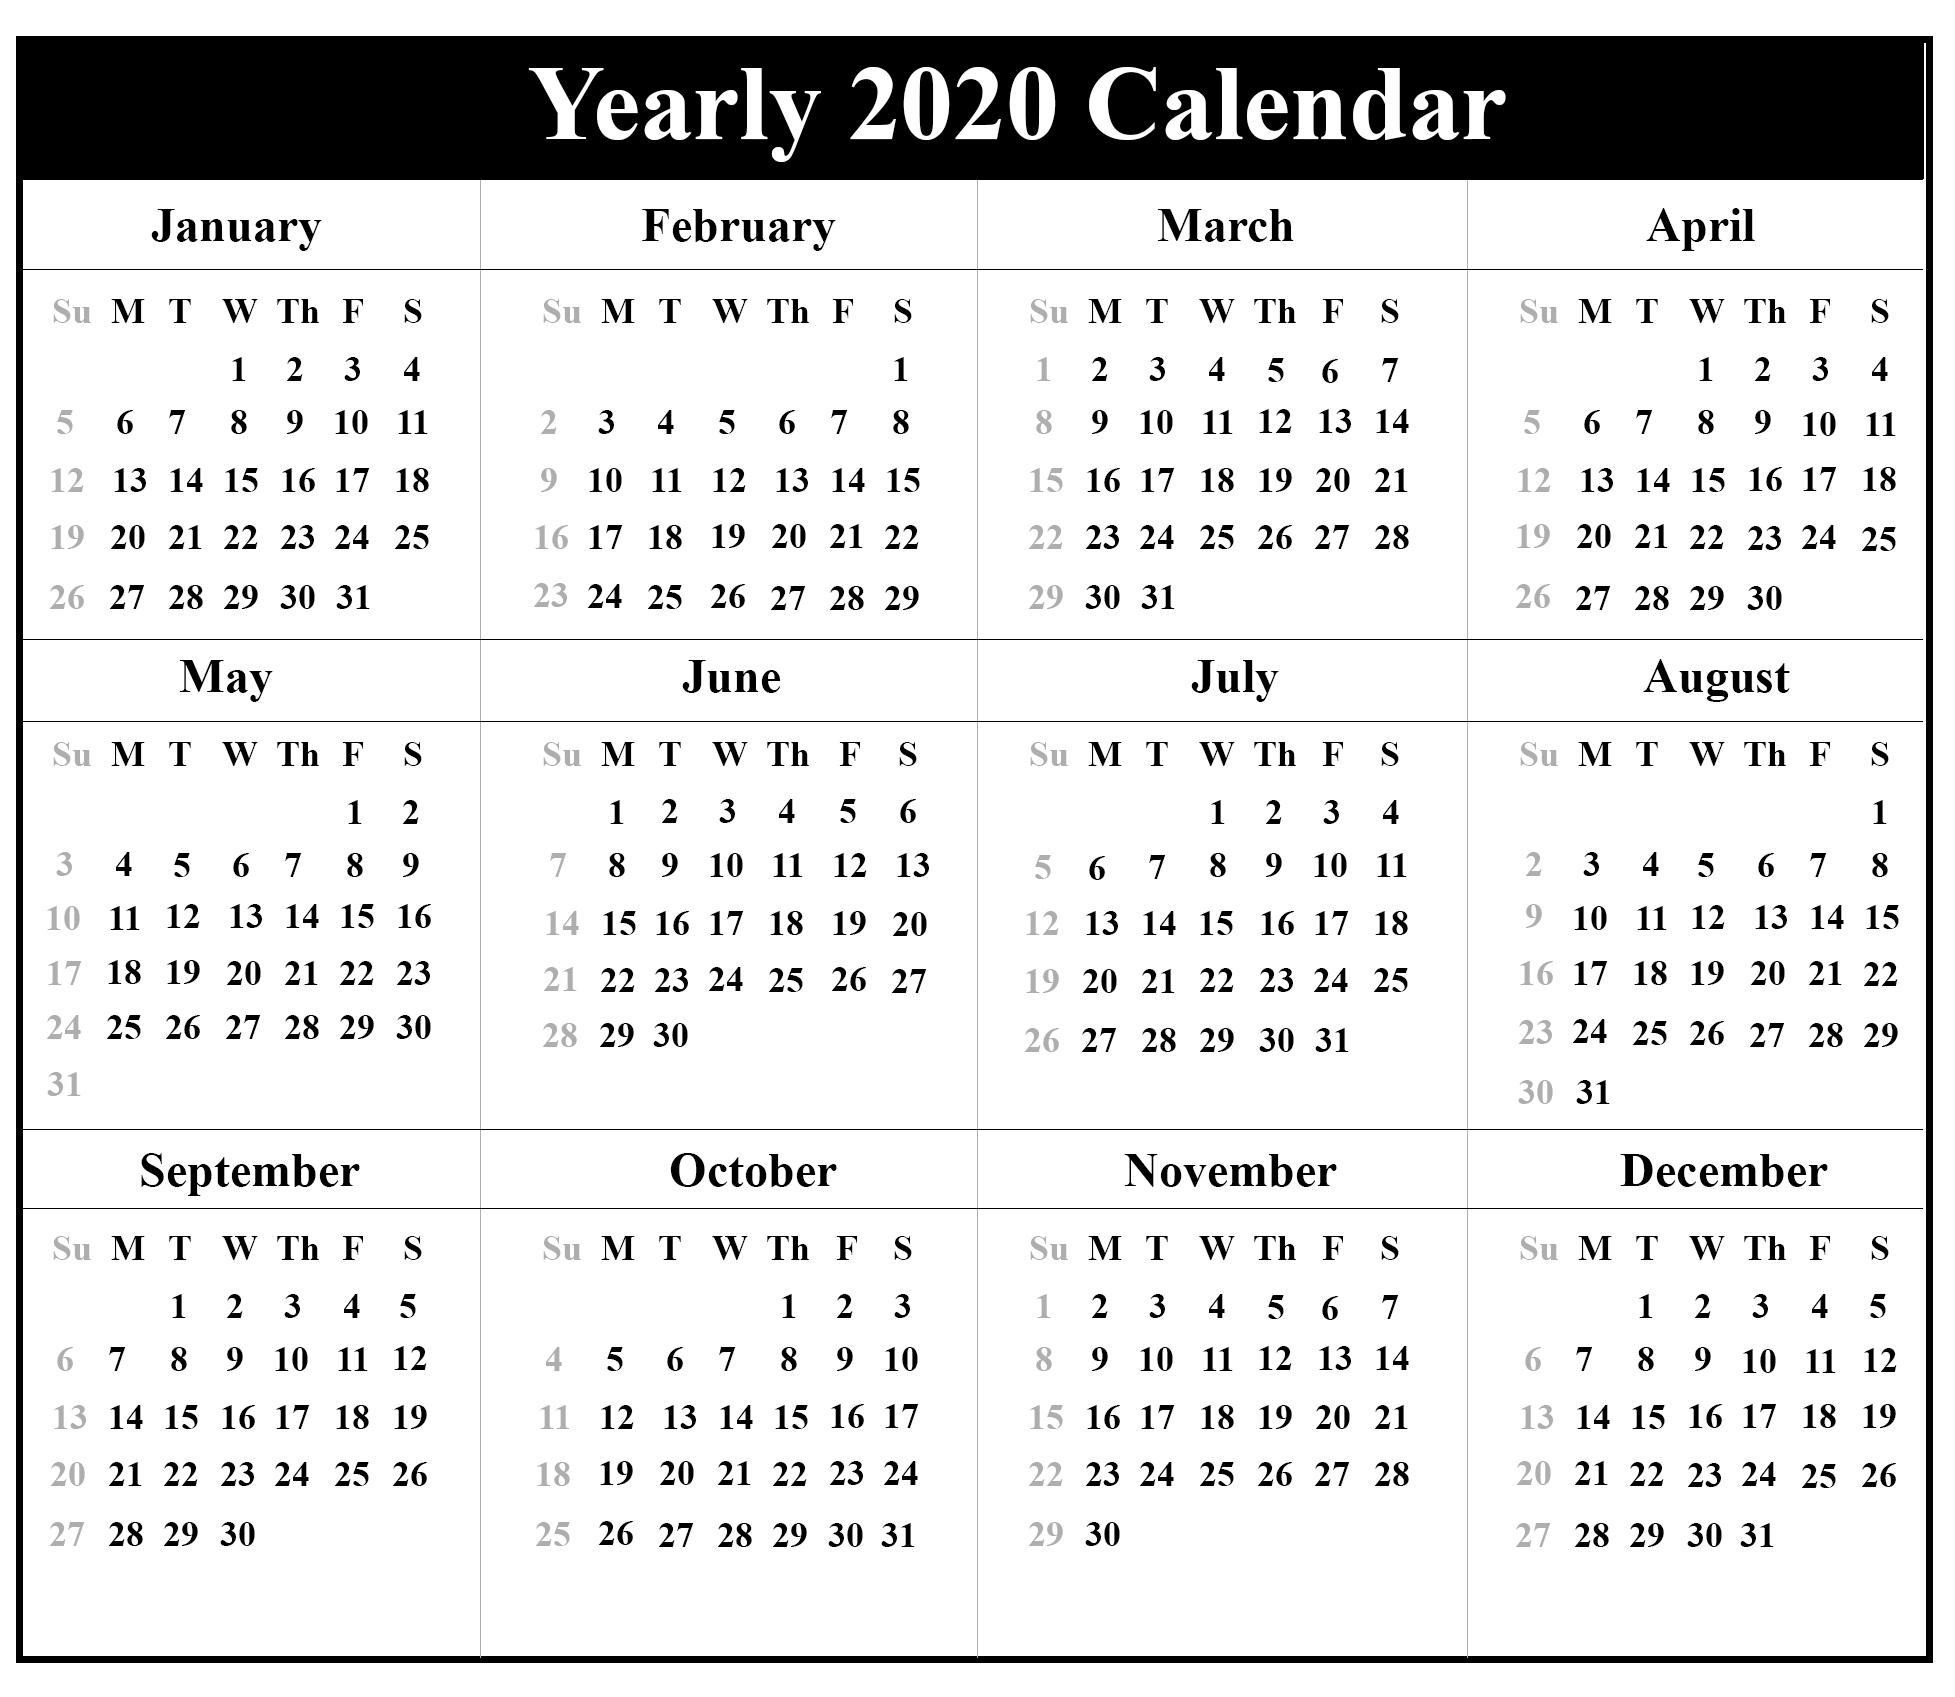 November 2020 Calendar Australia 2 - Wpa.wpart.co within 2020 Calendar Australian